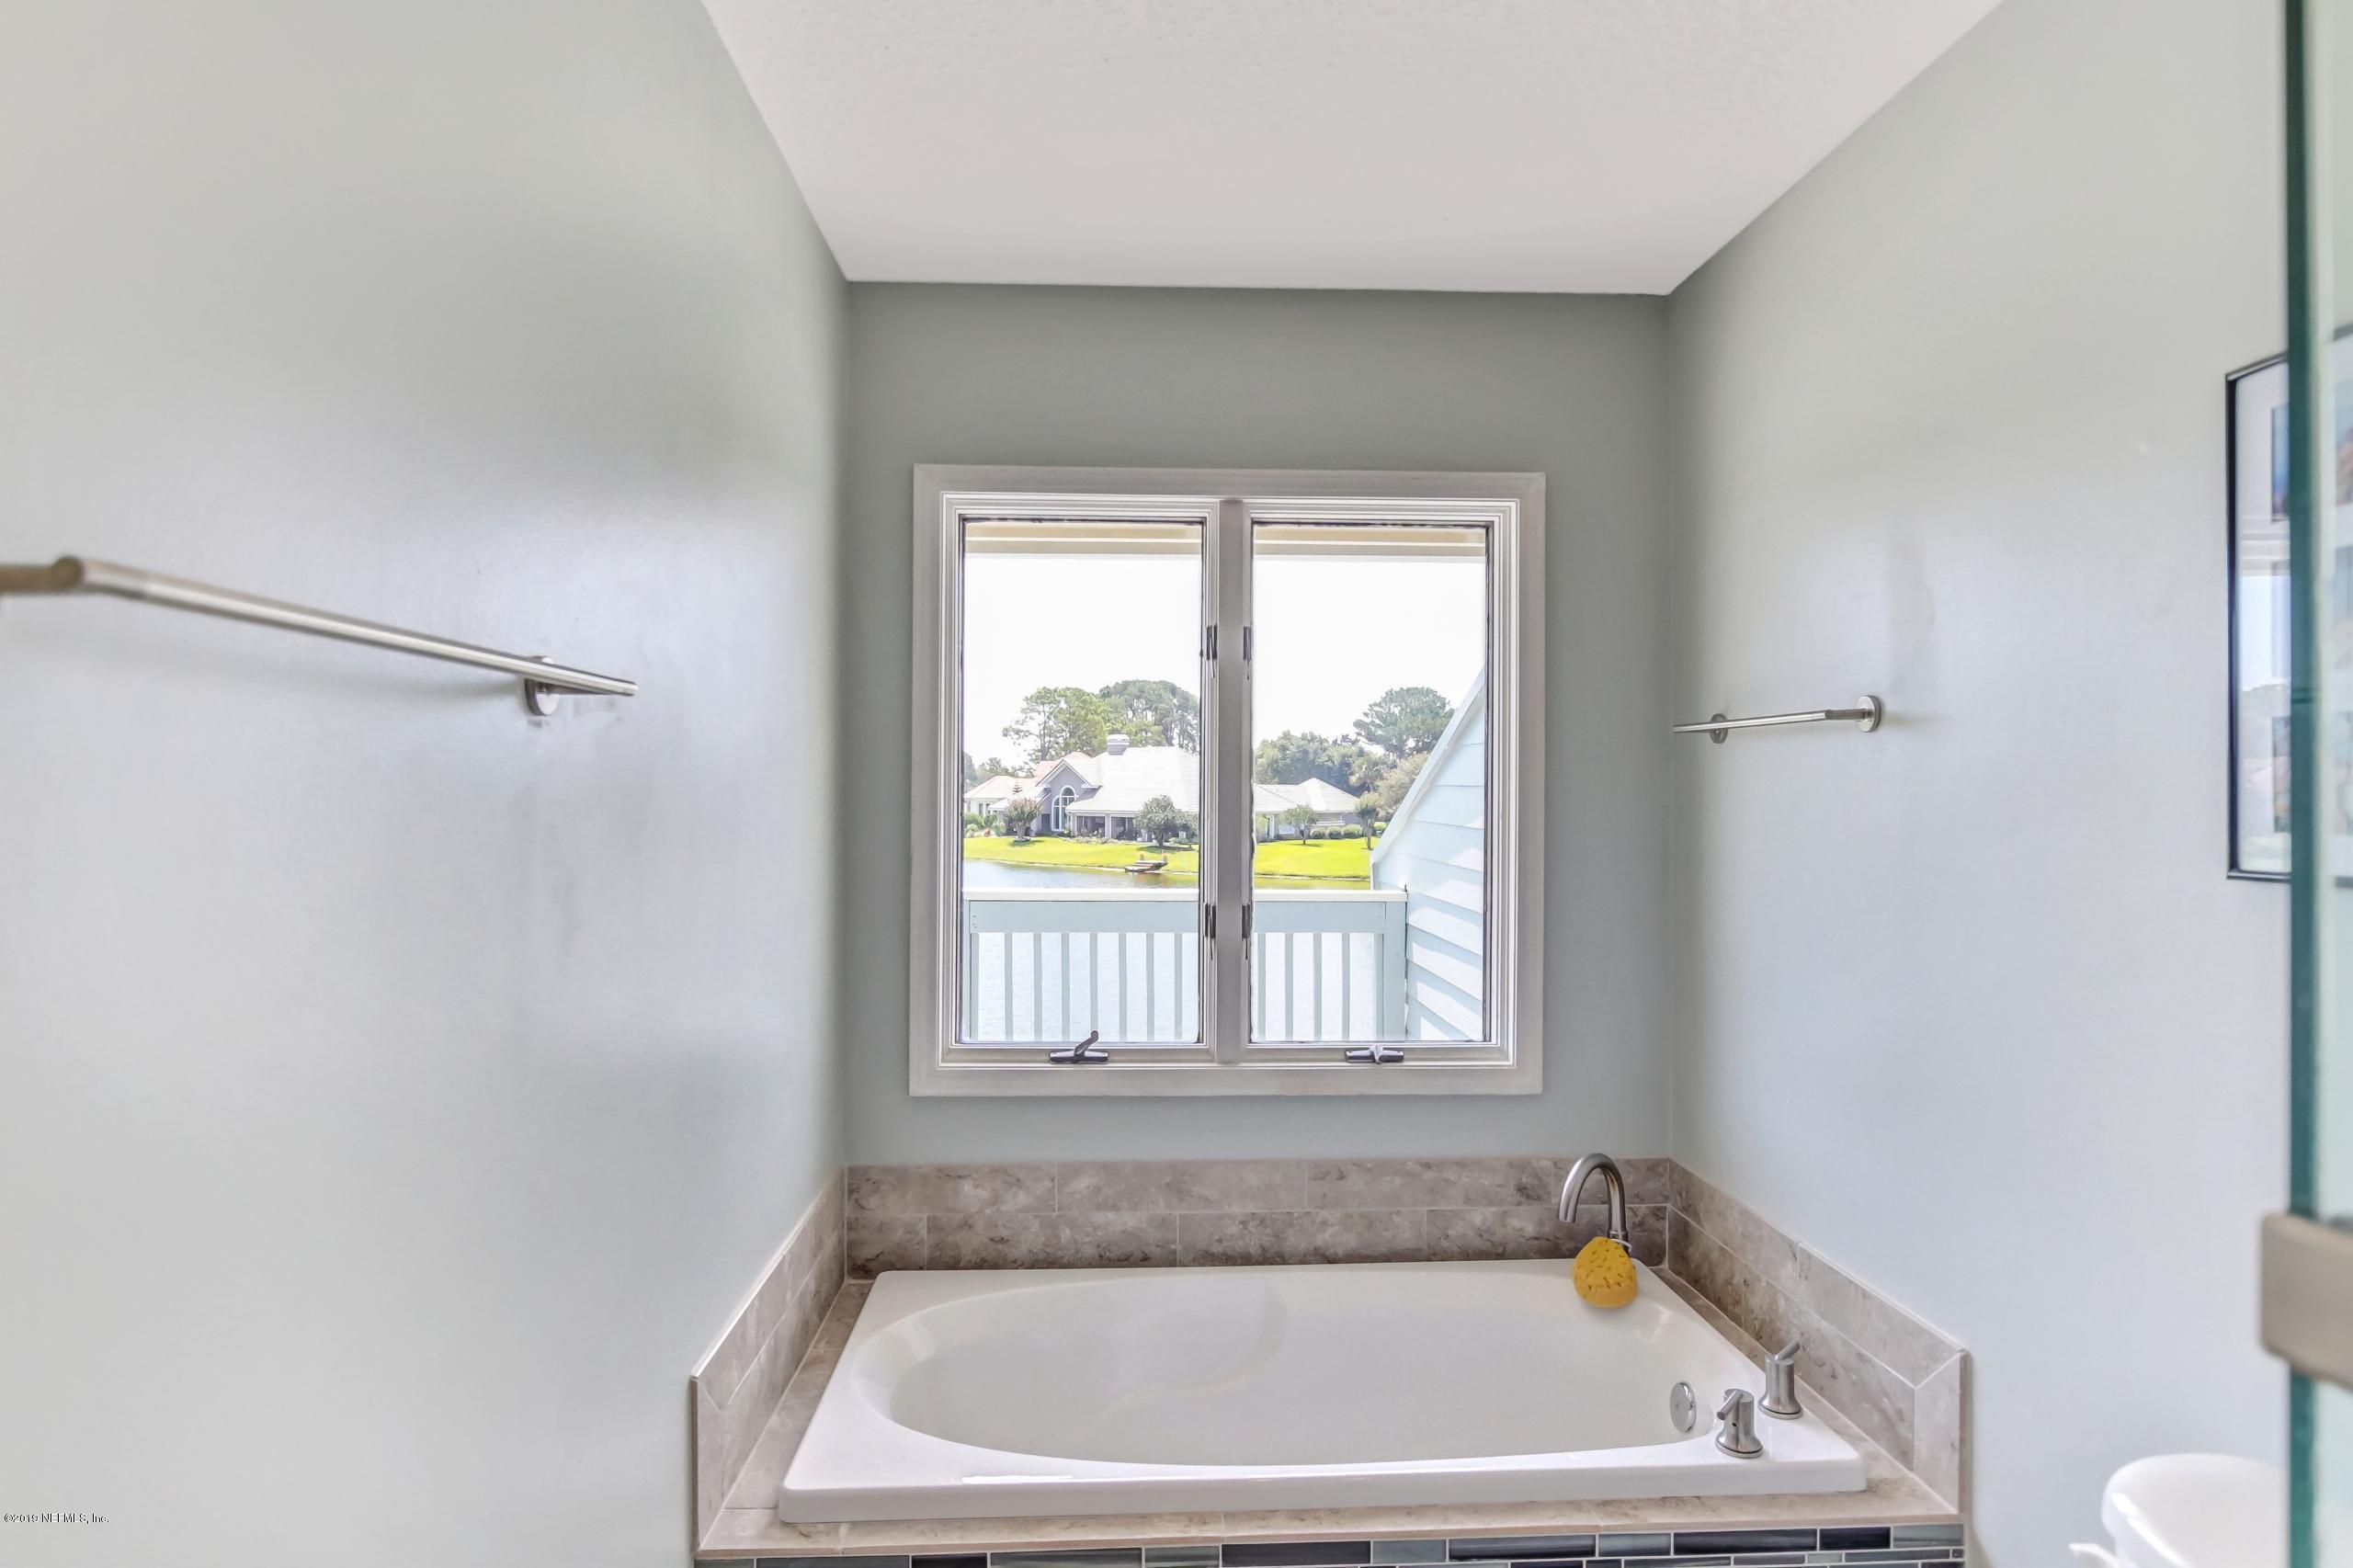 21 LITTLE BAY HARBOR, PONTE VEDRA BEACH, FLORIDA 32082, 3 Bedrooms Bedrooms, ,2 BathroomsBathrooms,Condo,For sale,LITTLE BAY HARBOR,1010300